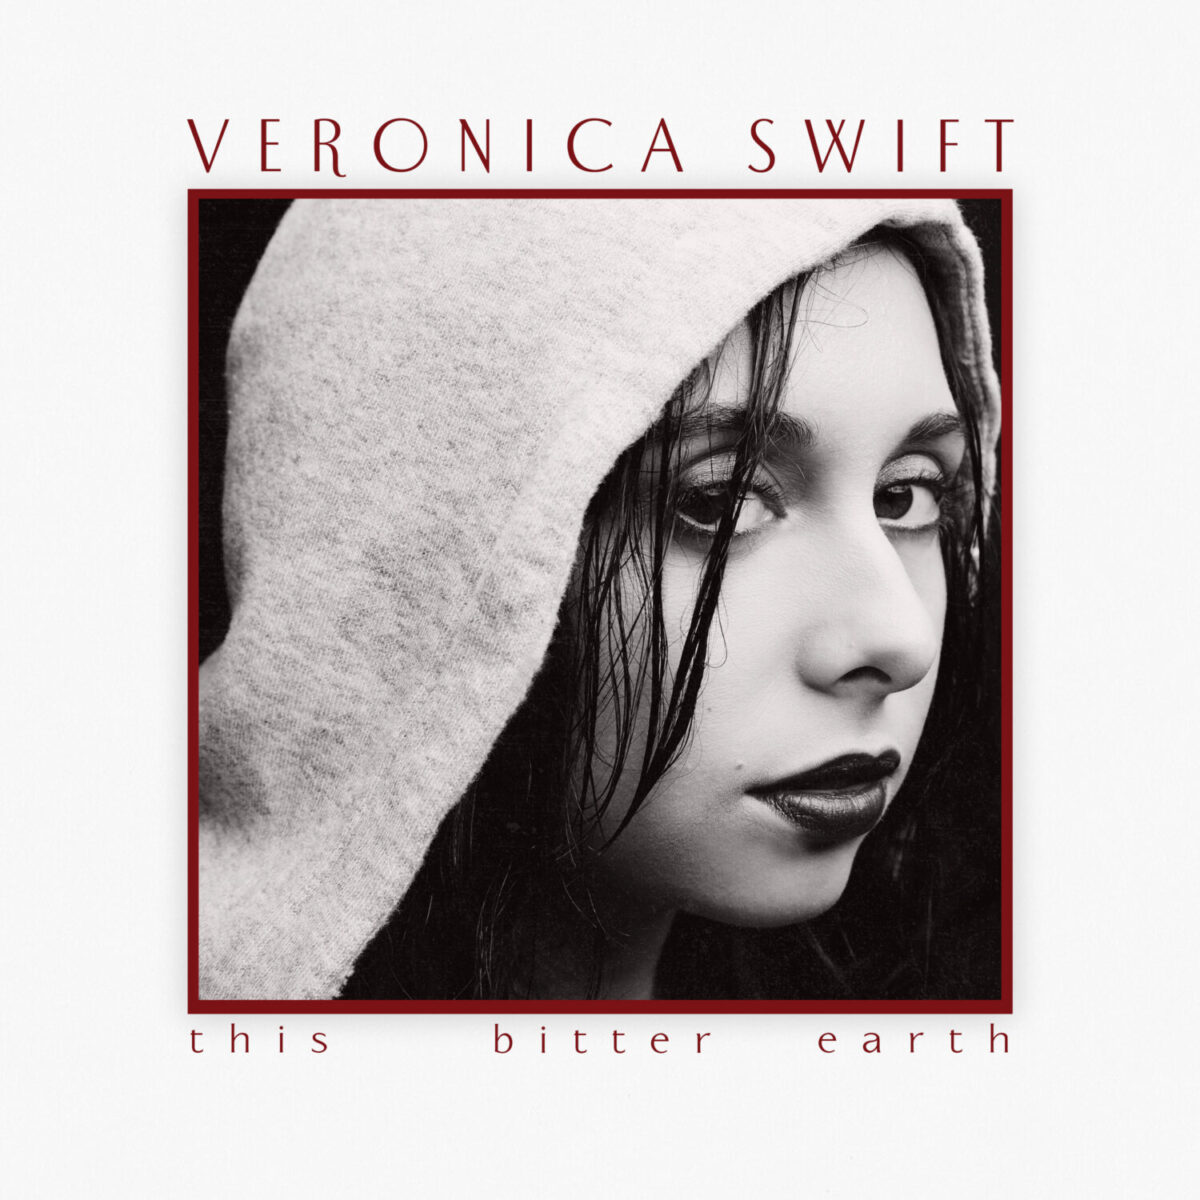 MAC1177 Veronica Swift - This Bitter Earth cover 3000x3000 rgb